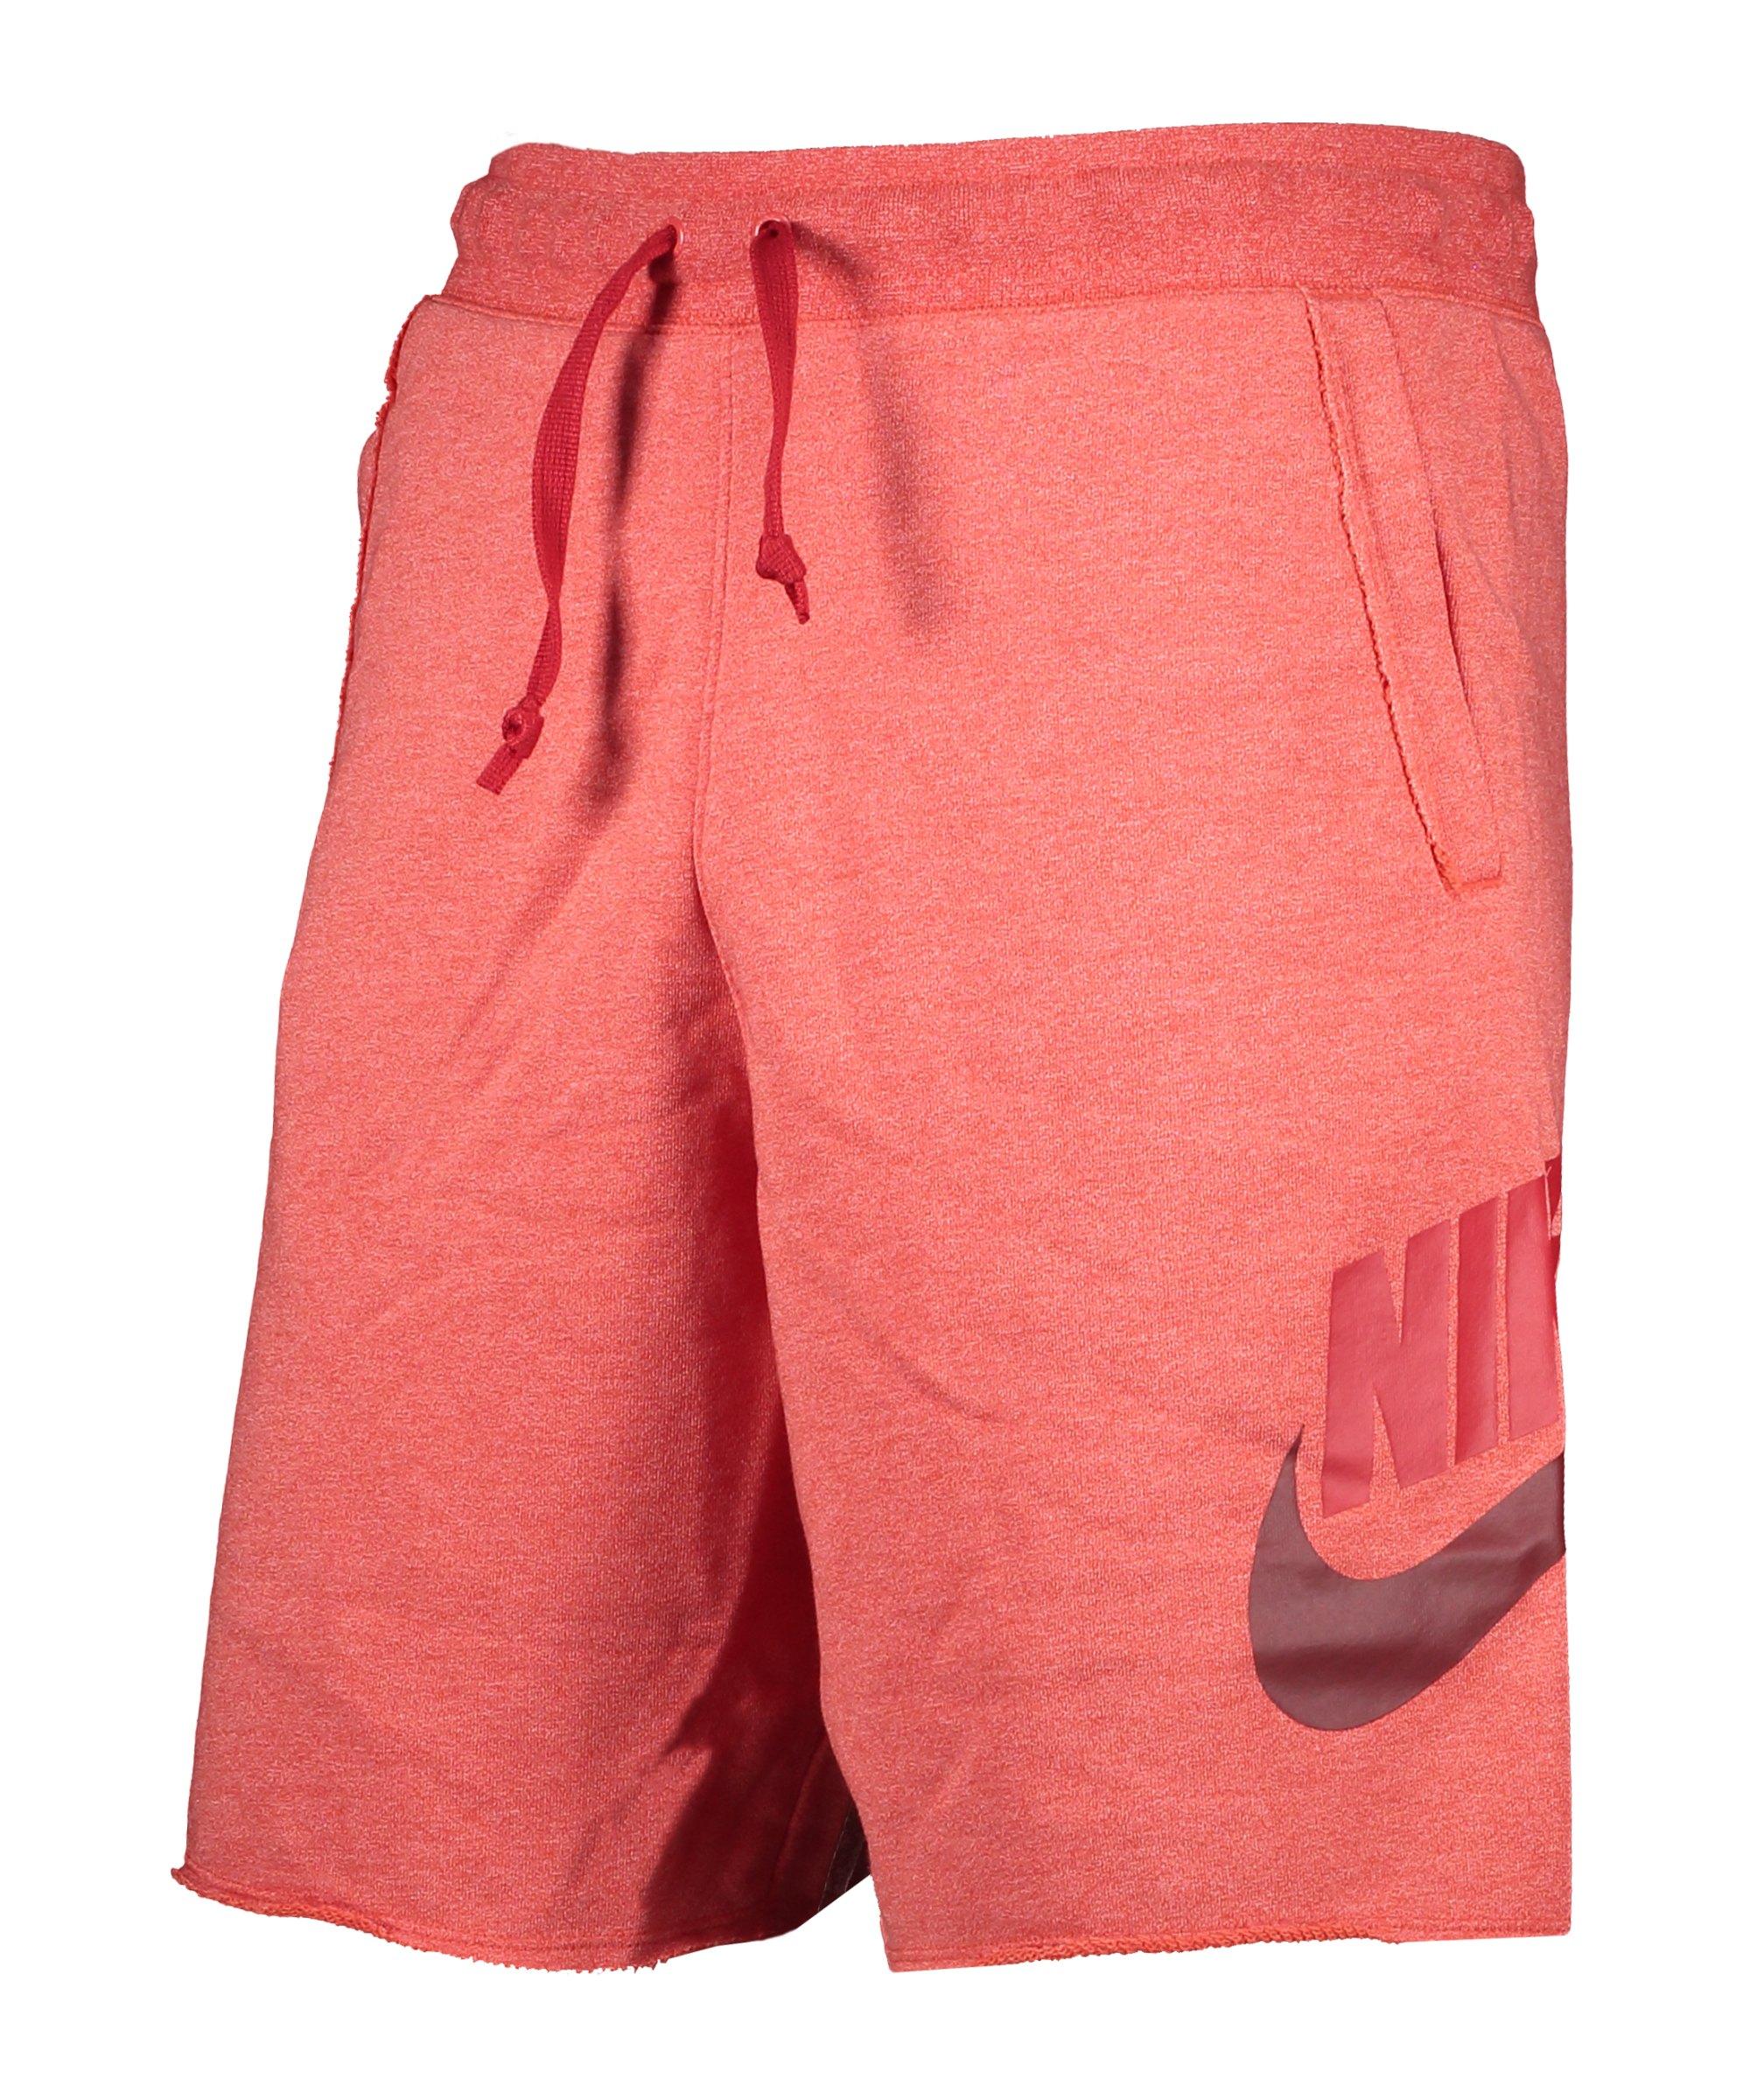 Nike Sportswear Alumni Short Rot F605 - rot